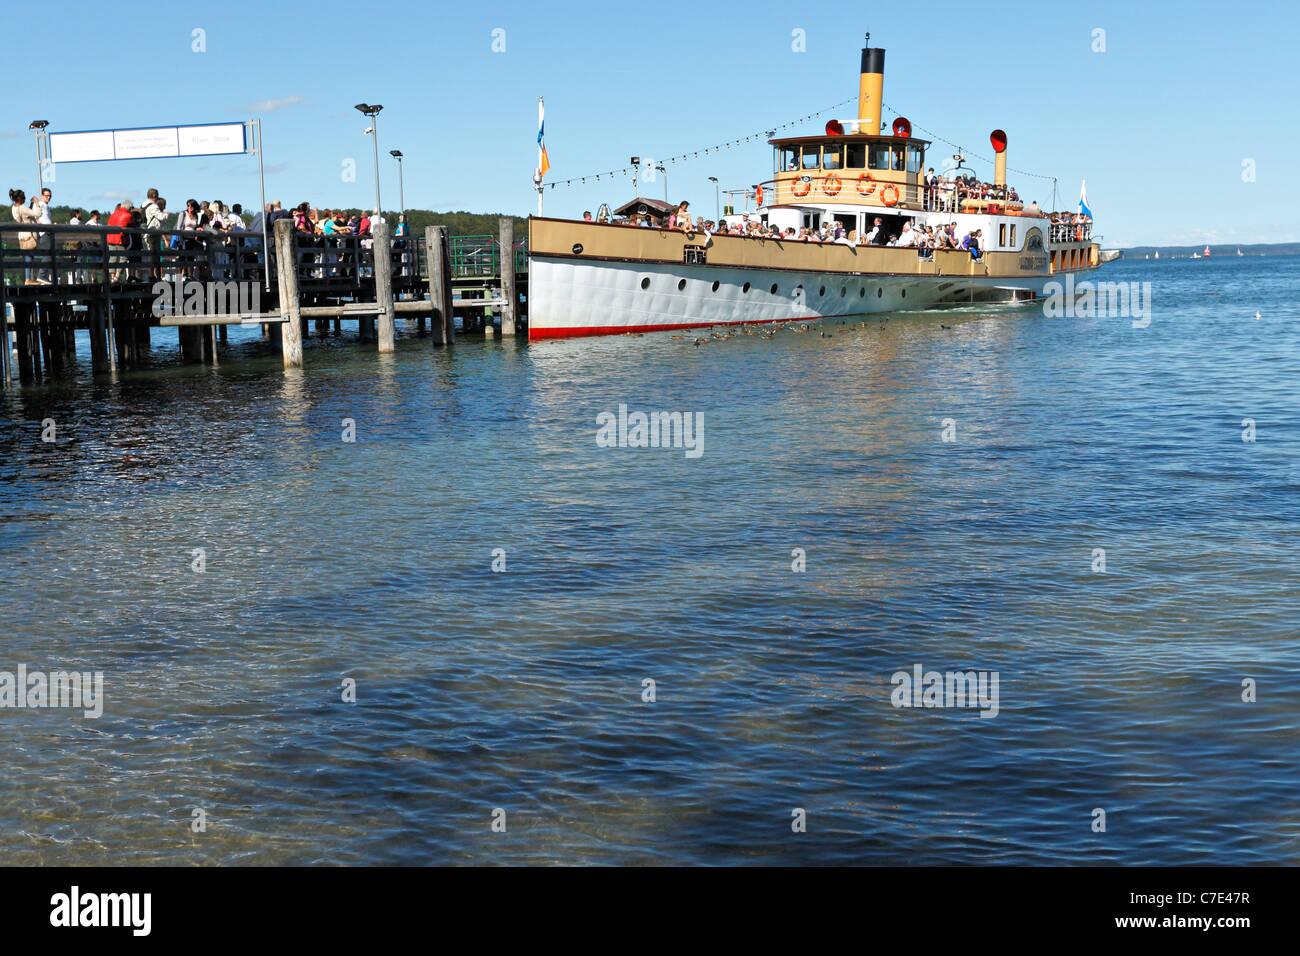 Chiemsee Ferry Boat at the Herreninsel, Chiemgau Upper Bavaria Germany - Stock Image